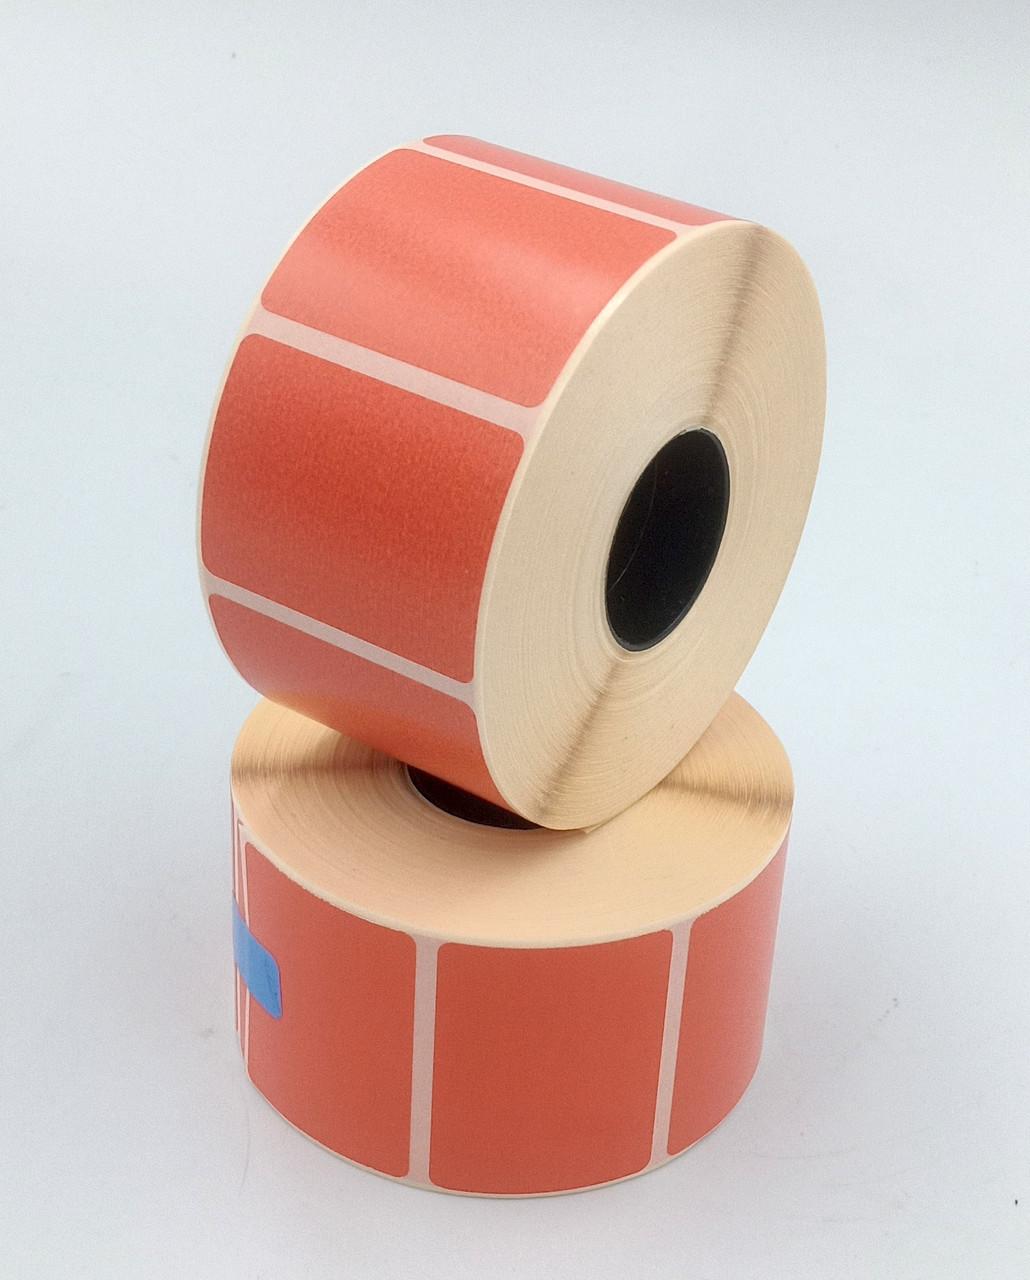 Mobitehnika Термоетикетка для весов, етикеточних принтерів Т.Еко пантон червона 40*30 1000шт вт. 25мм